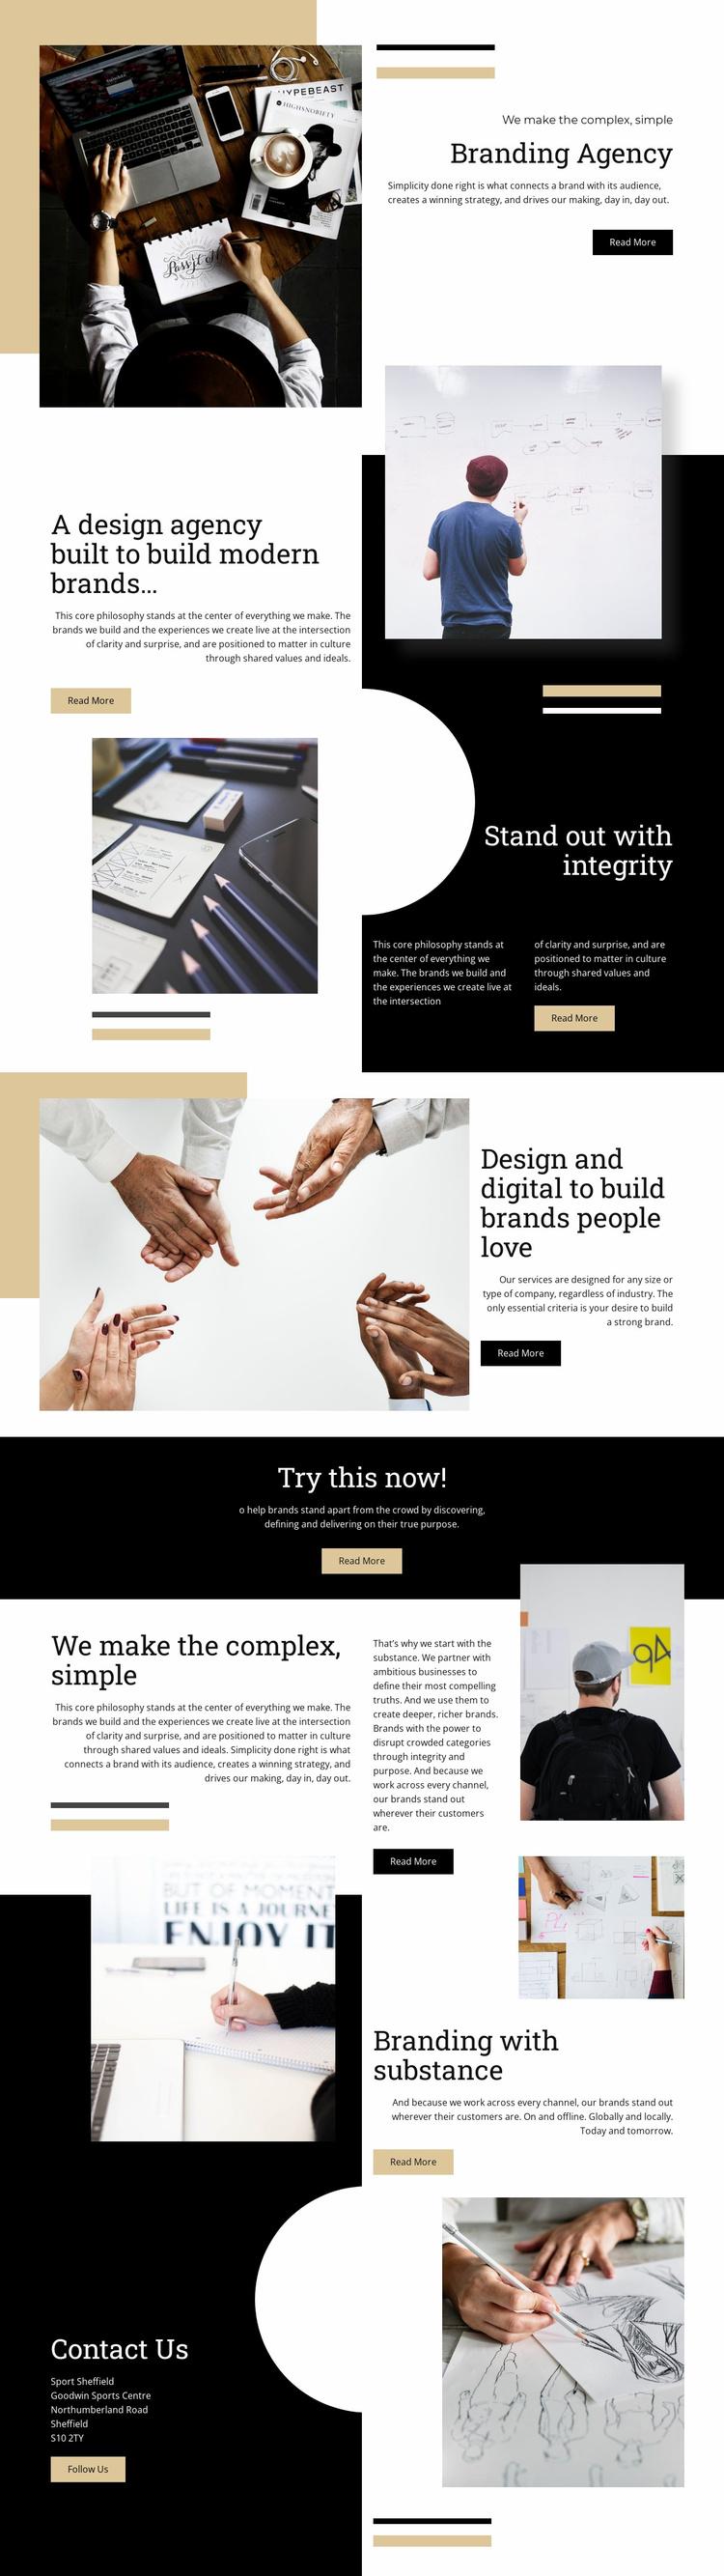 Branding Agency Landing Page